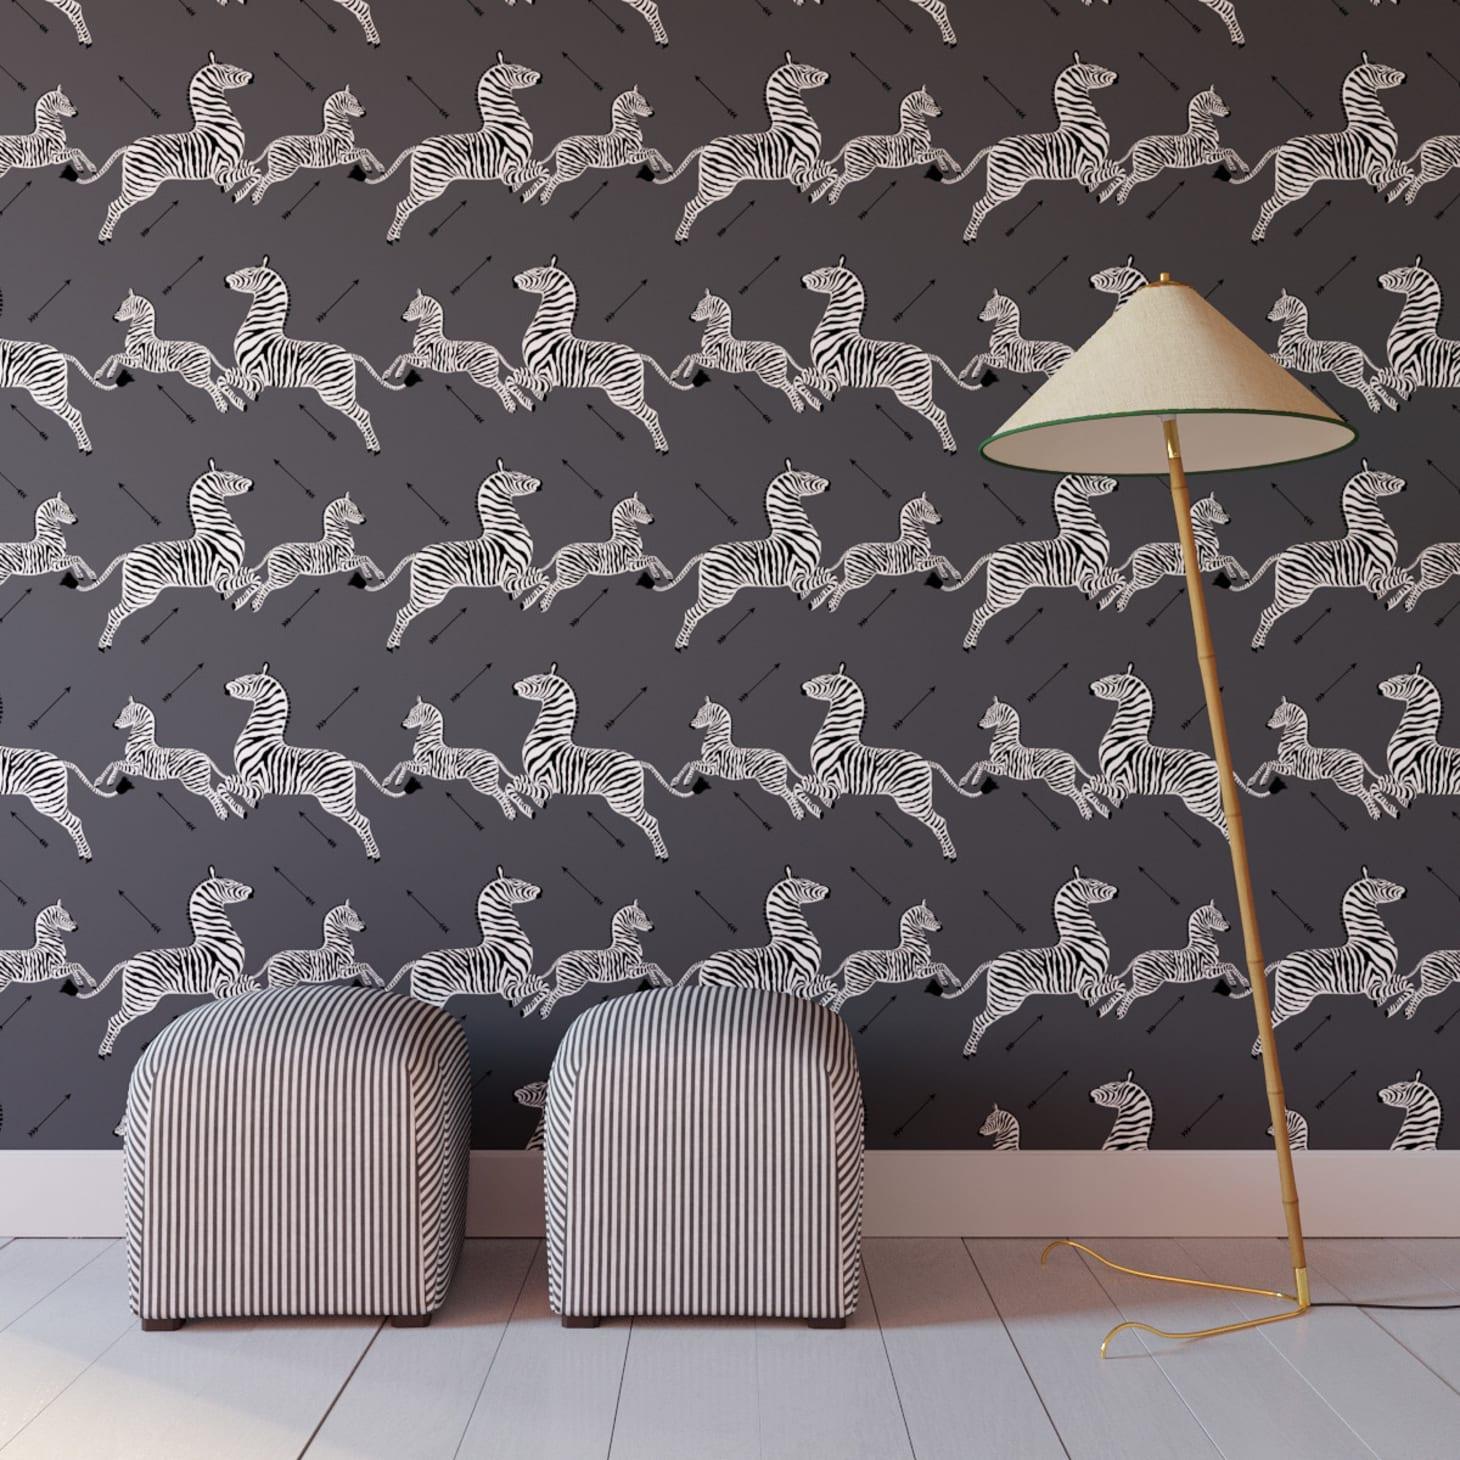 Royal Tenenbaums Zebra Wallpaper Peel-and-Stick Scalamandre ...